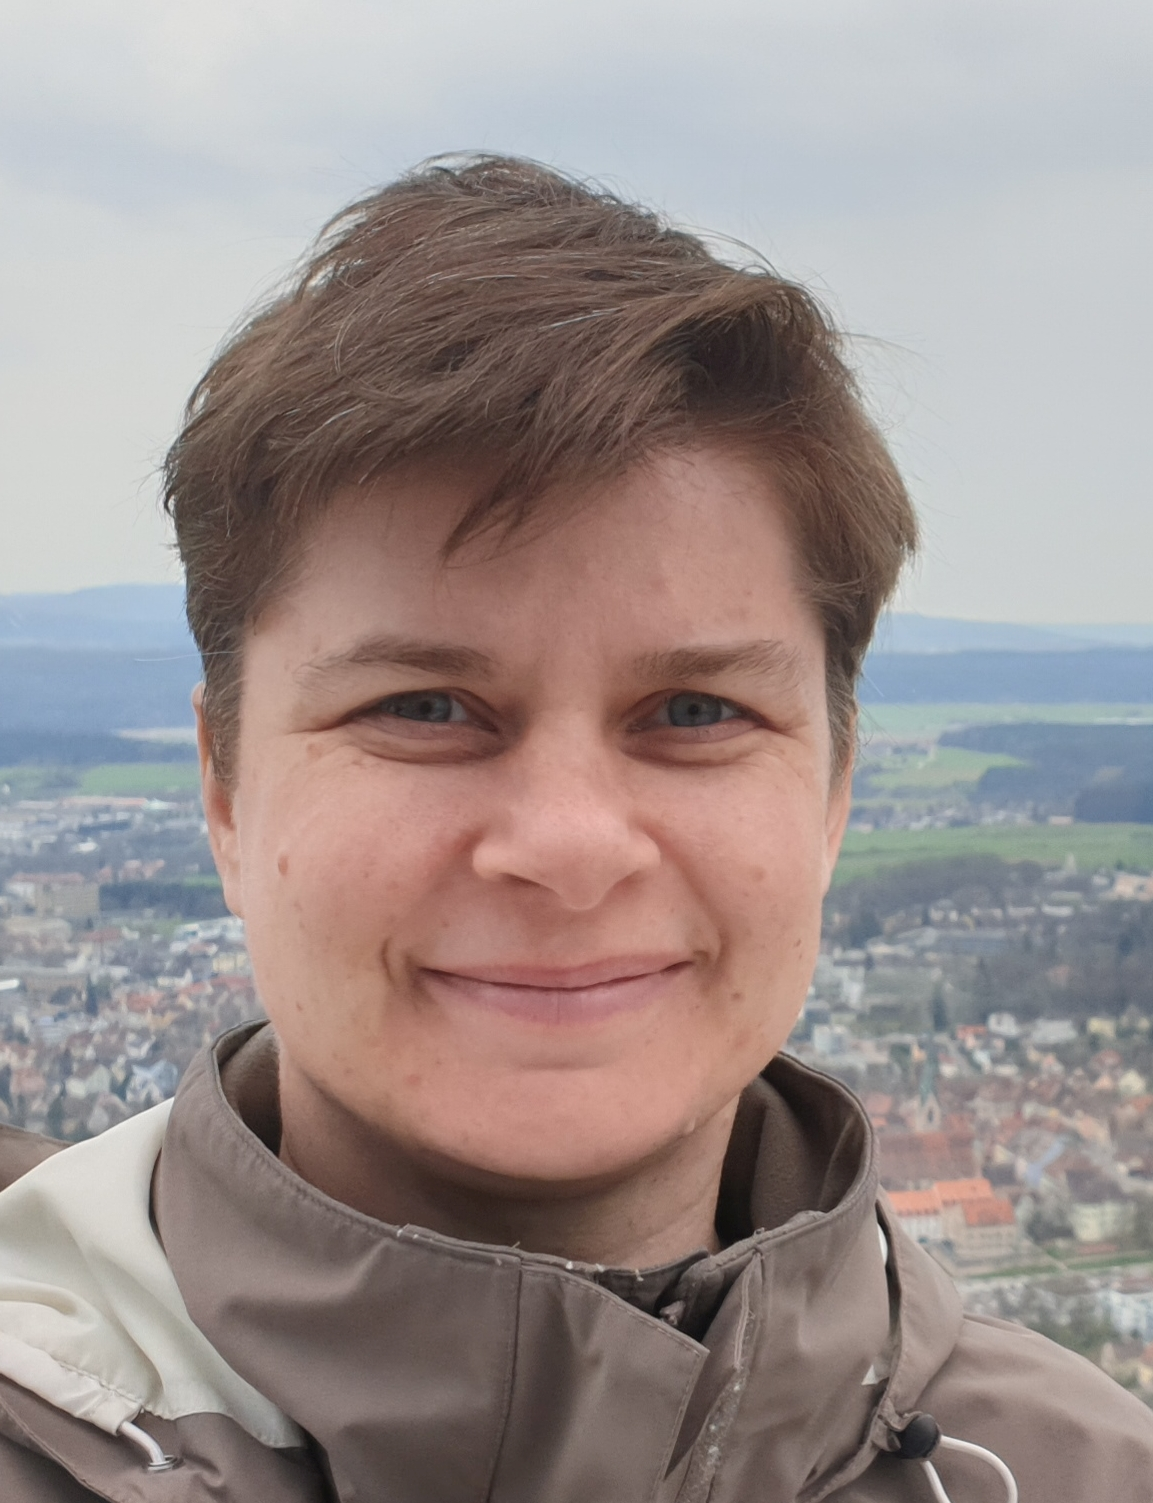 Irene Kuhn